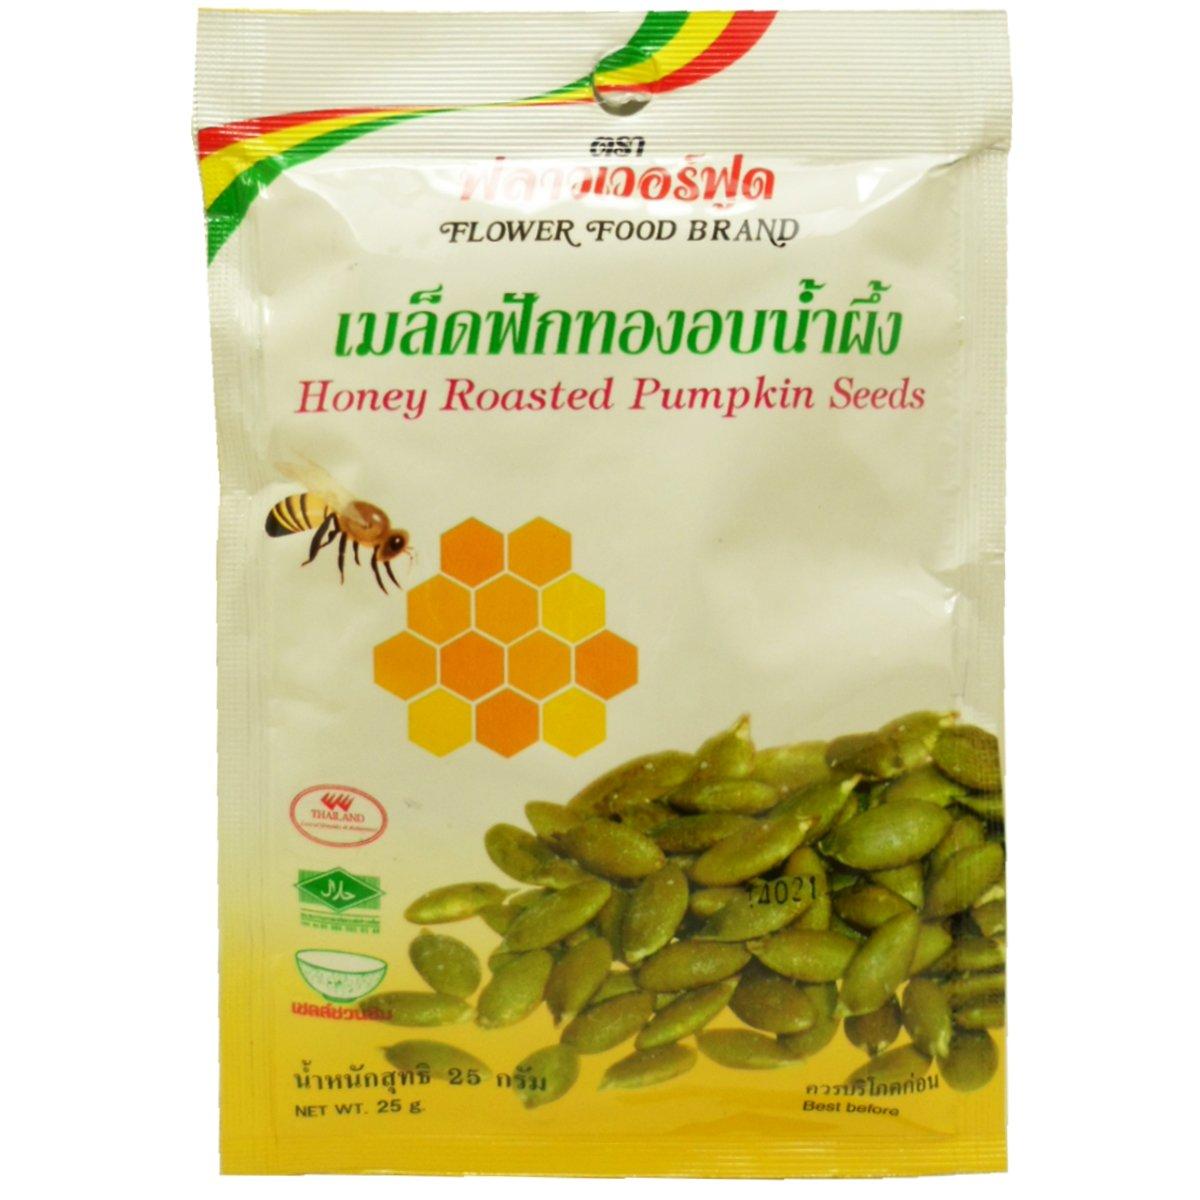 Honey Roasted Pumpkin Seeds Snack Net Wt X 25 Bag 2 0.88 G Oz Max ! Super beauty product restock quality top! 80% OFF